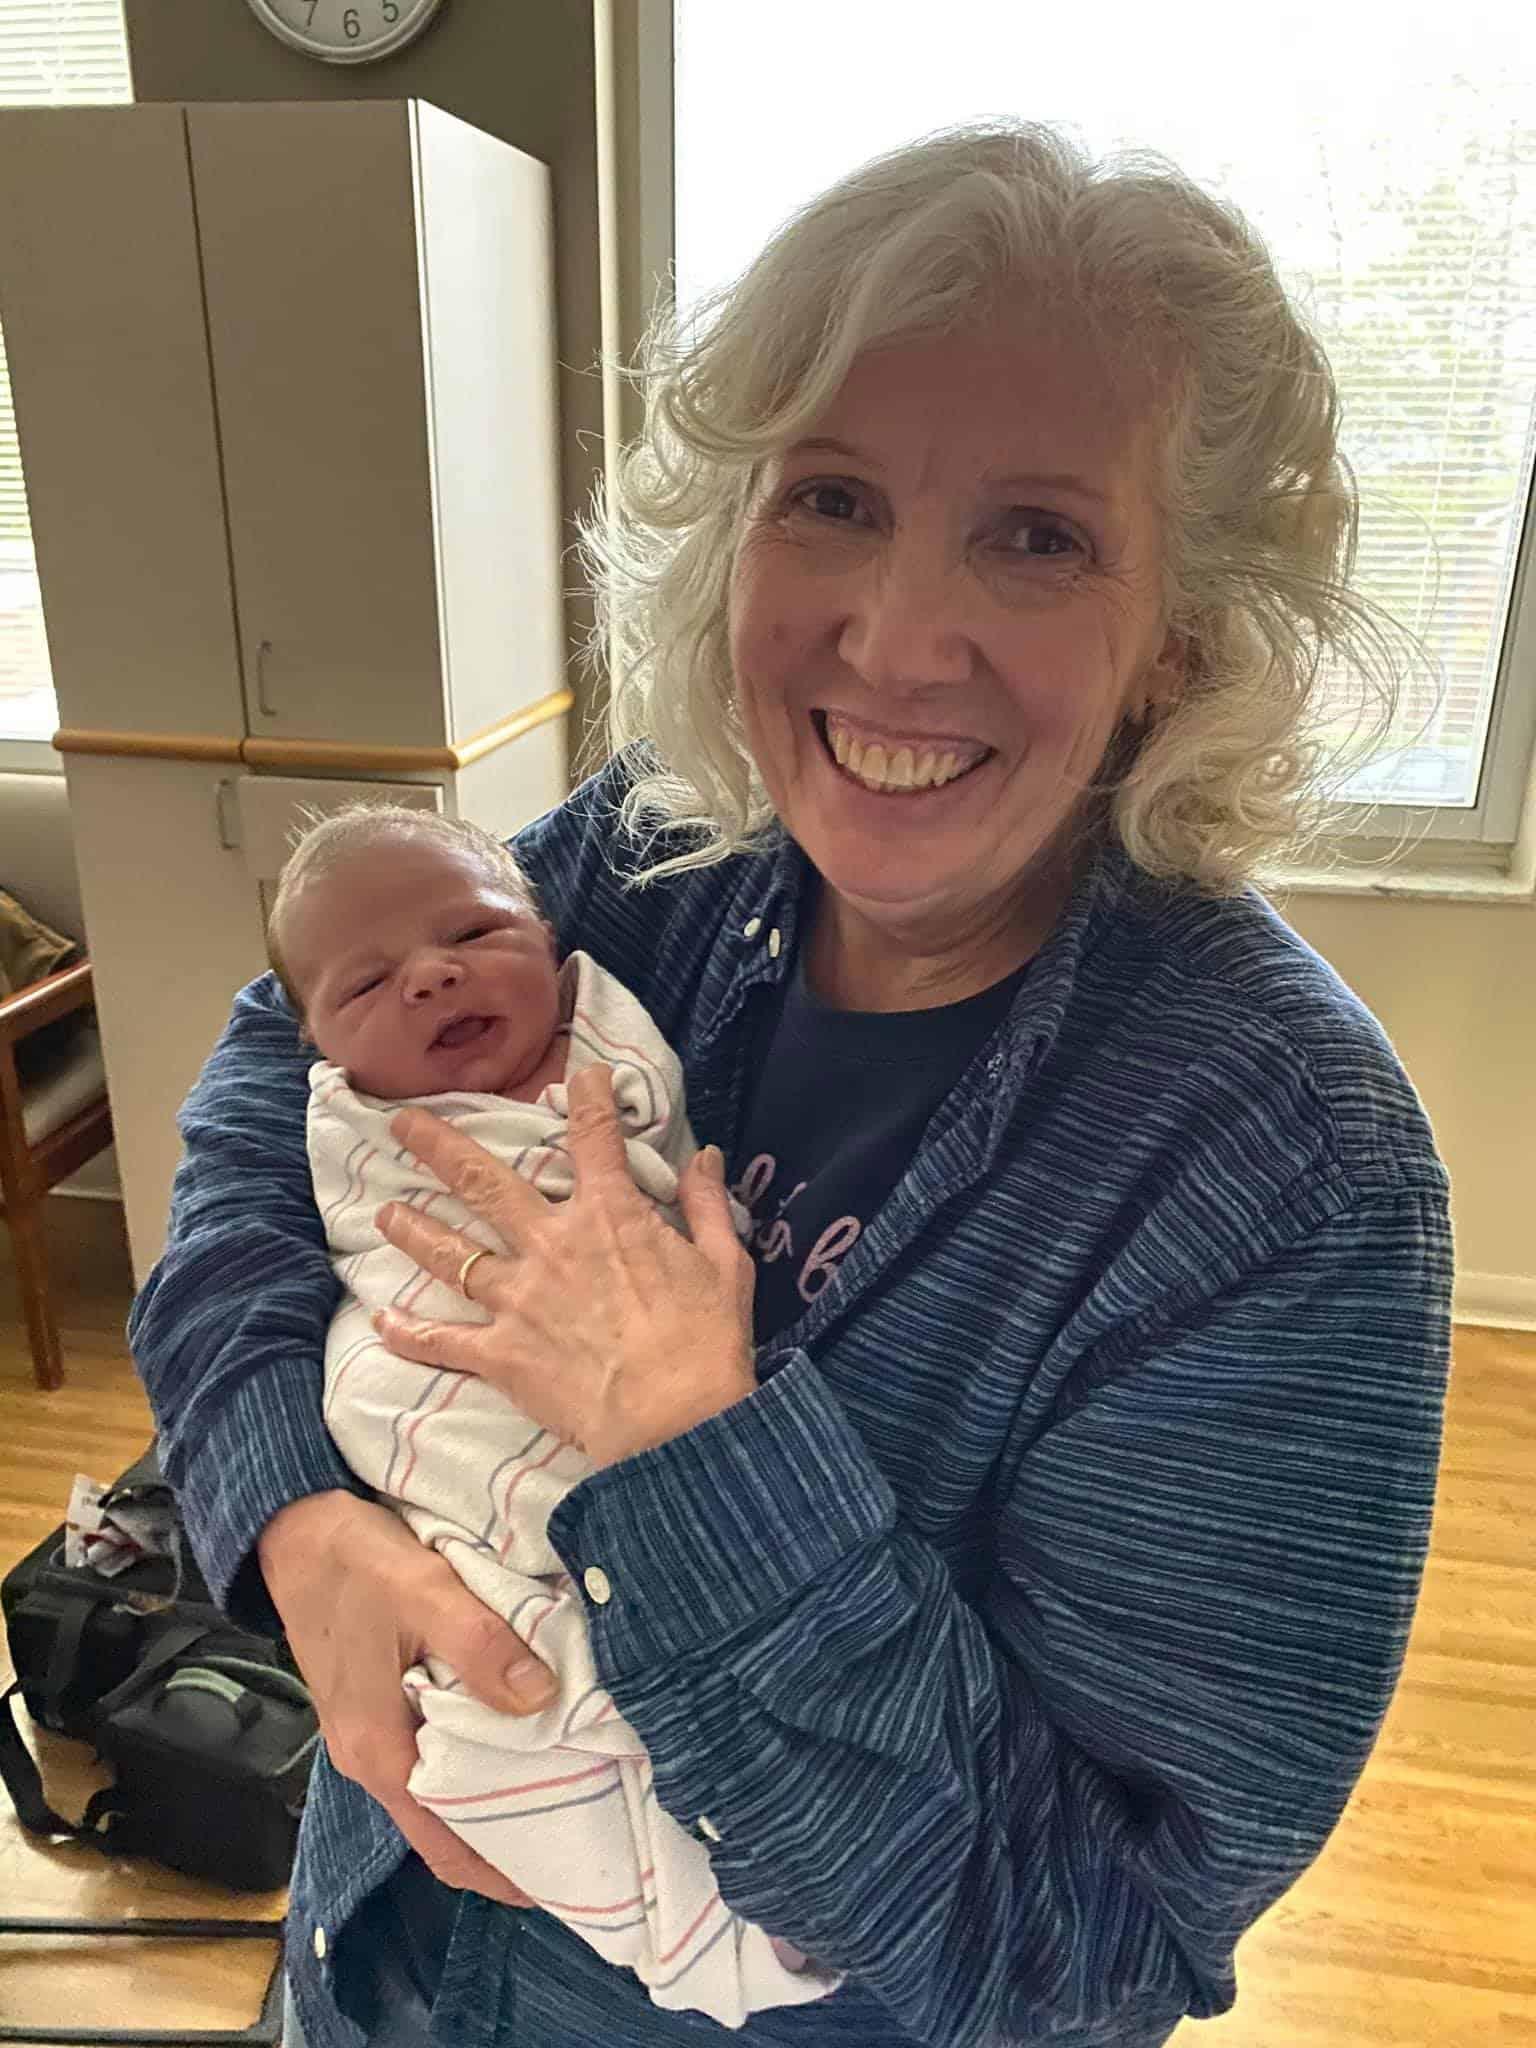 debbie perdew doula holding newborn baby boy Hudson